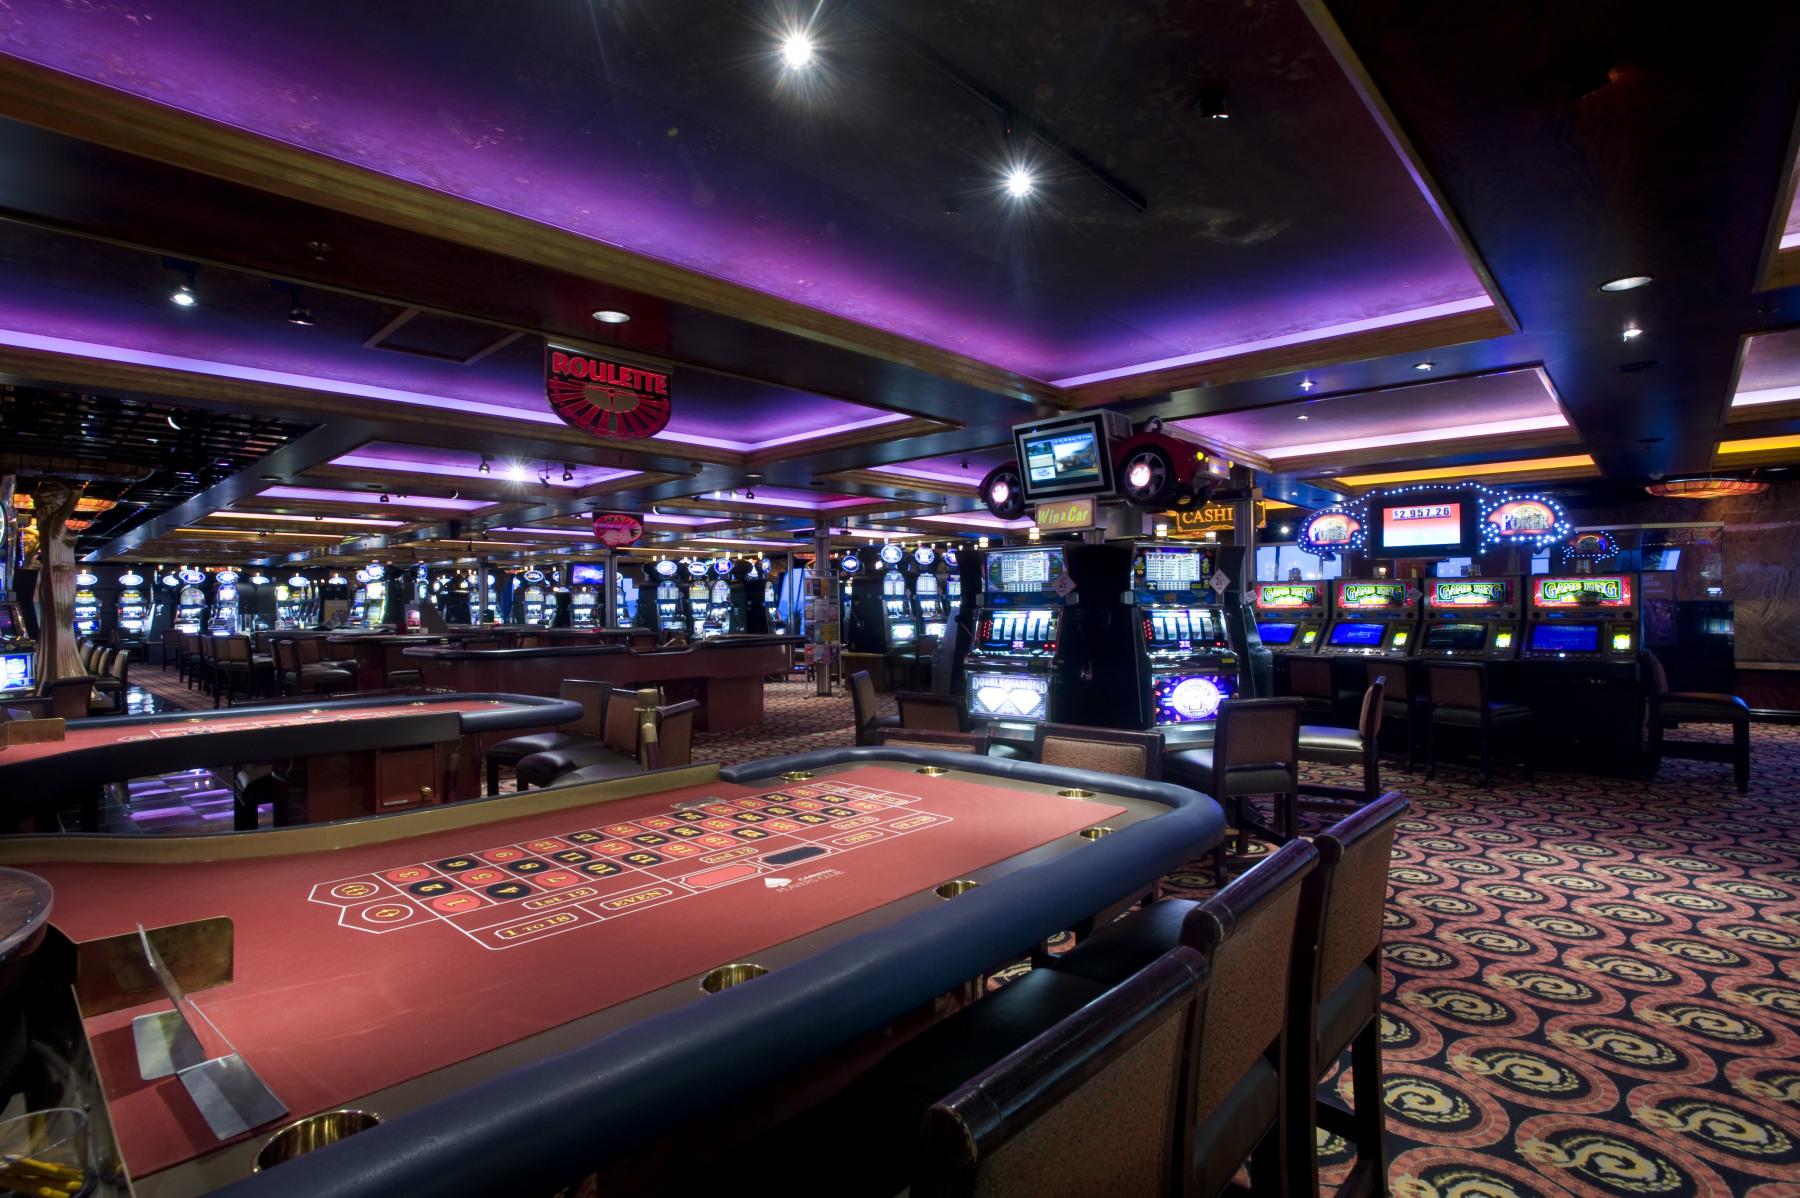 Carnival Fascination Casino Royale 1.jpg